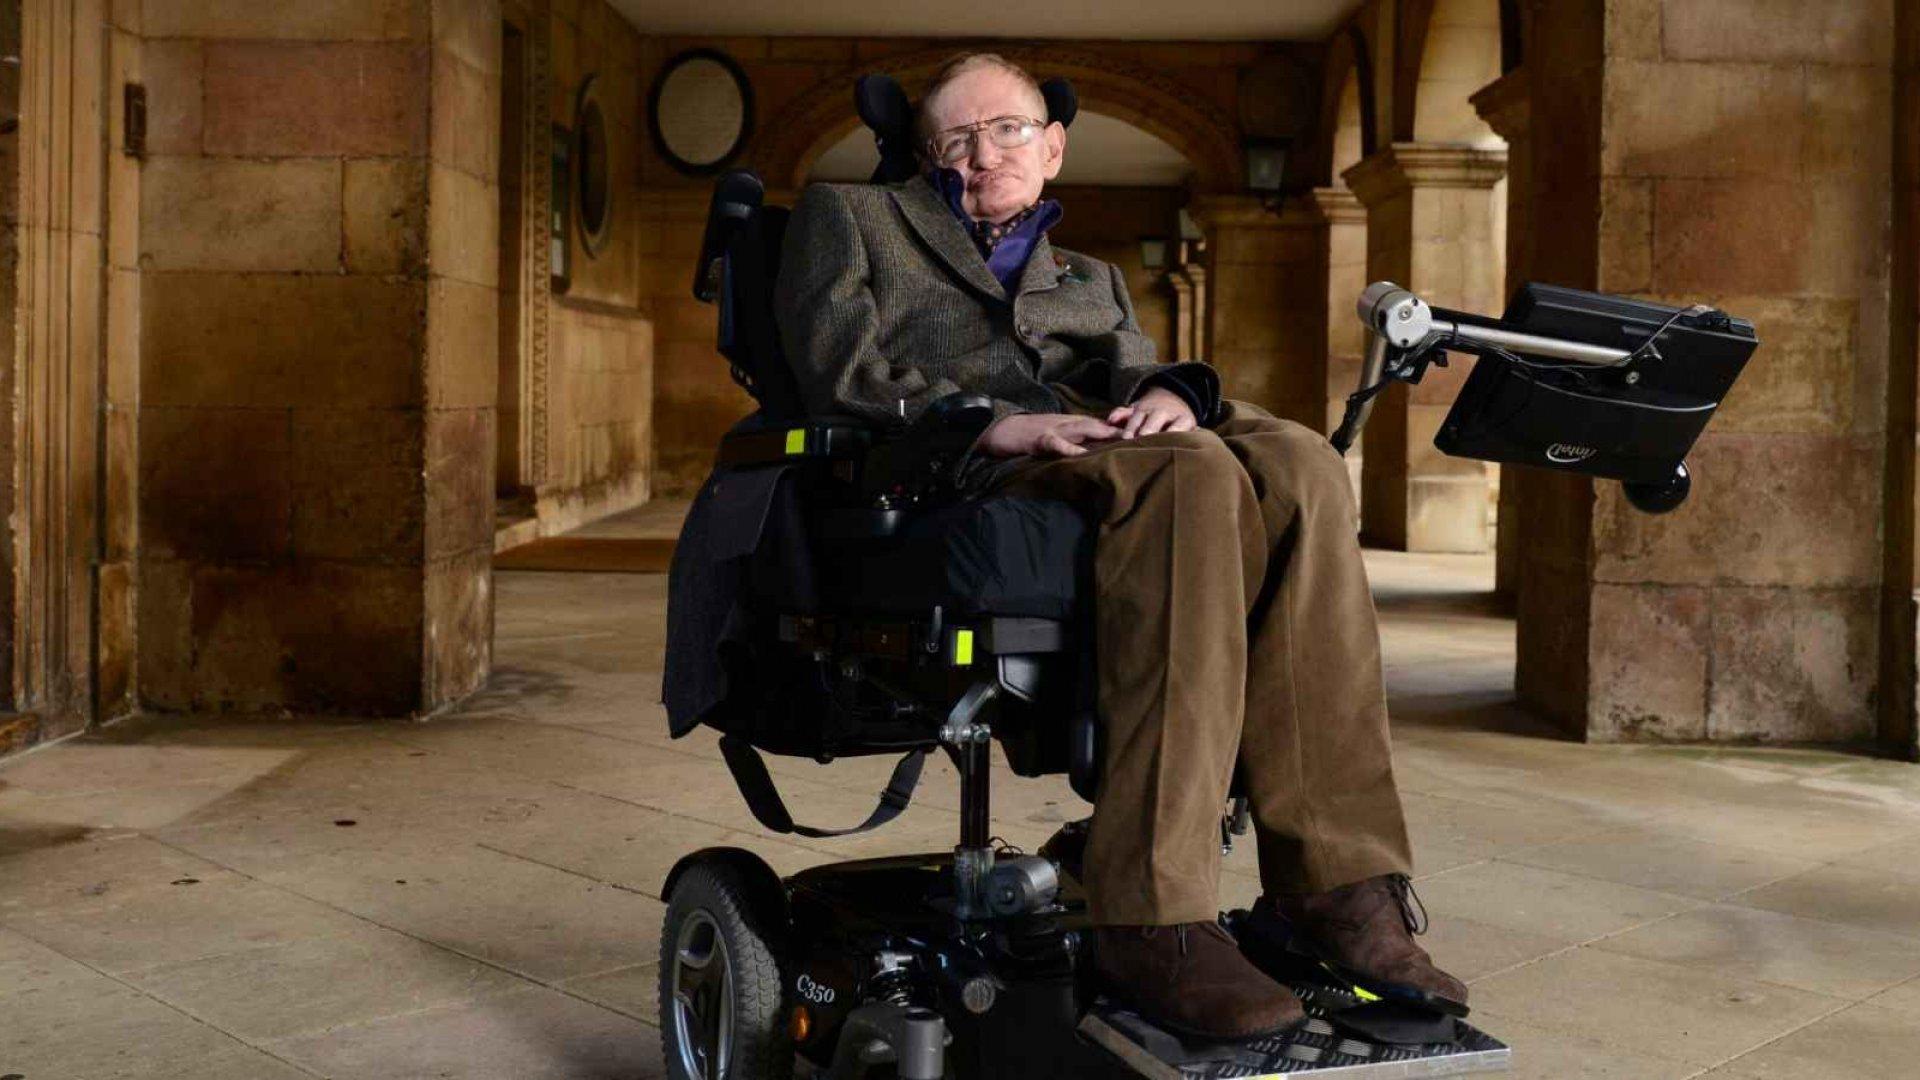 The Best Stephen Hawking Quotes to Inspire Your Inner Genius